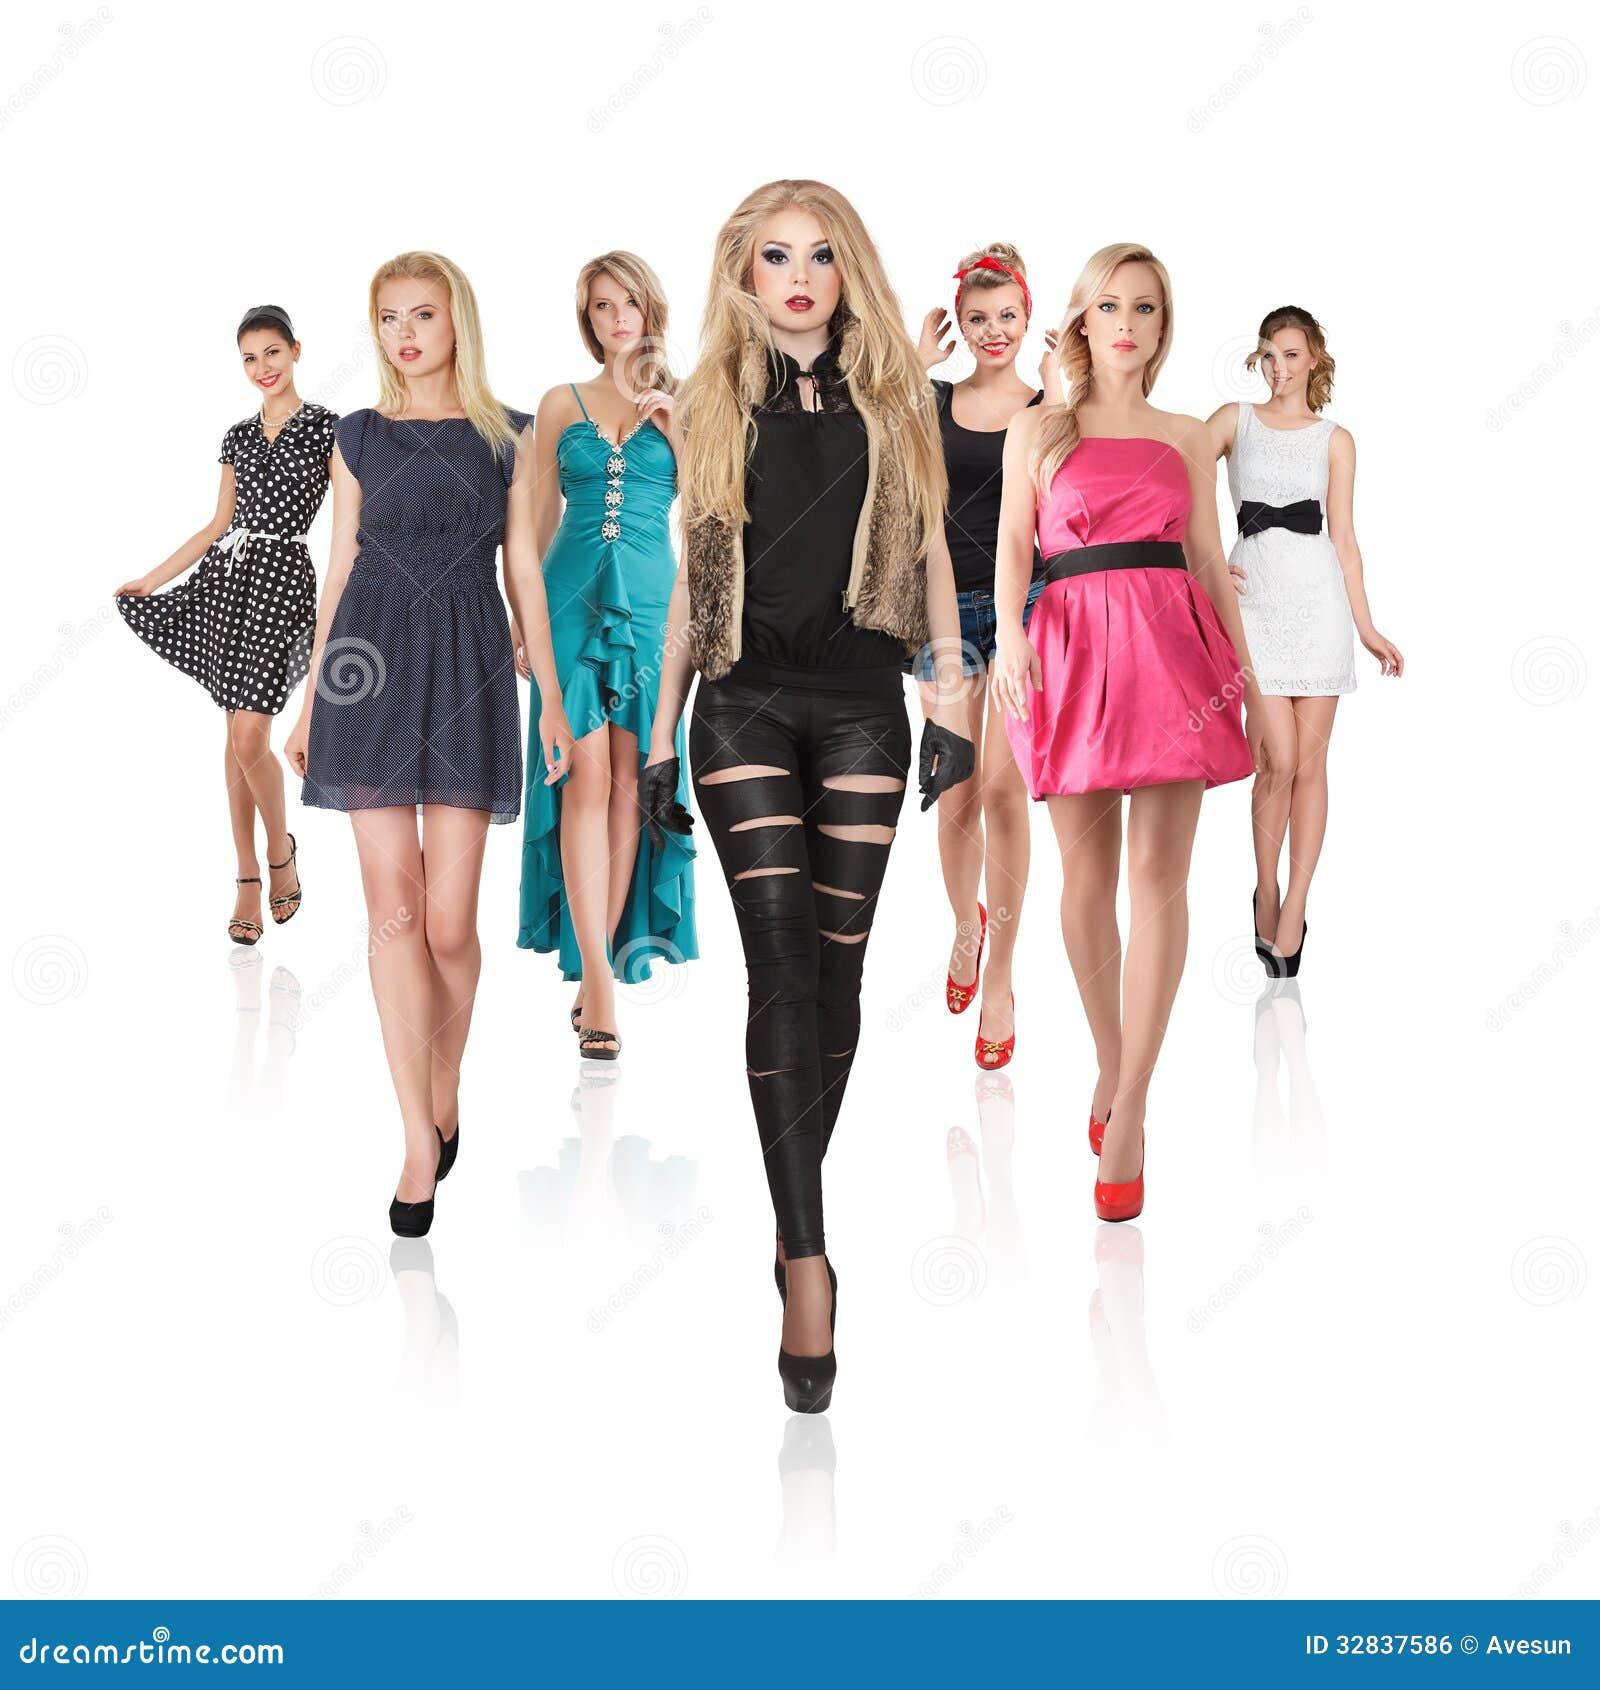 2019 year style- Women fashionable photo